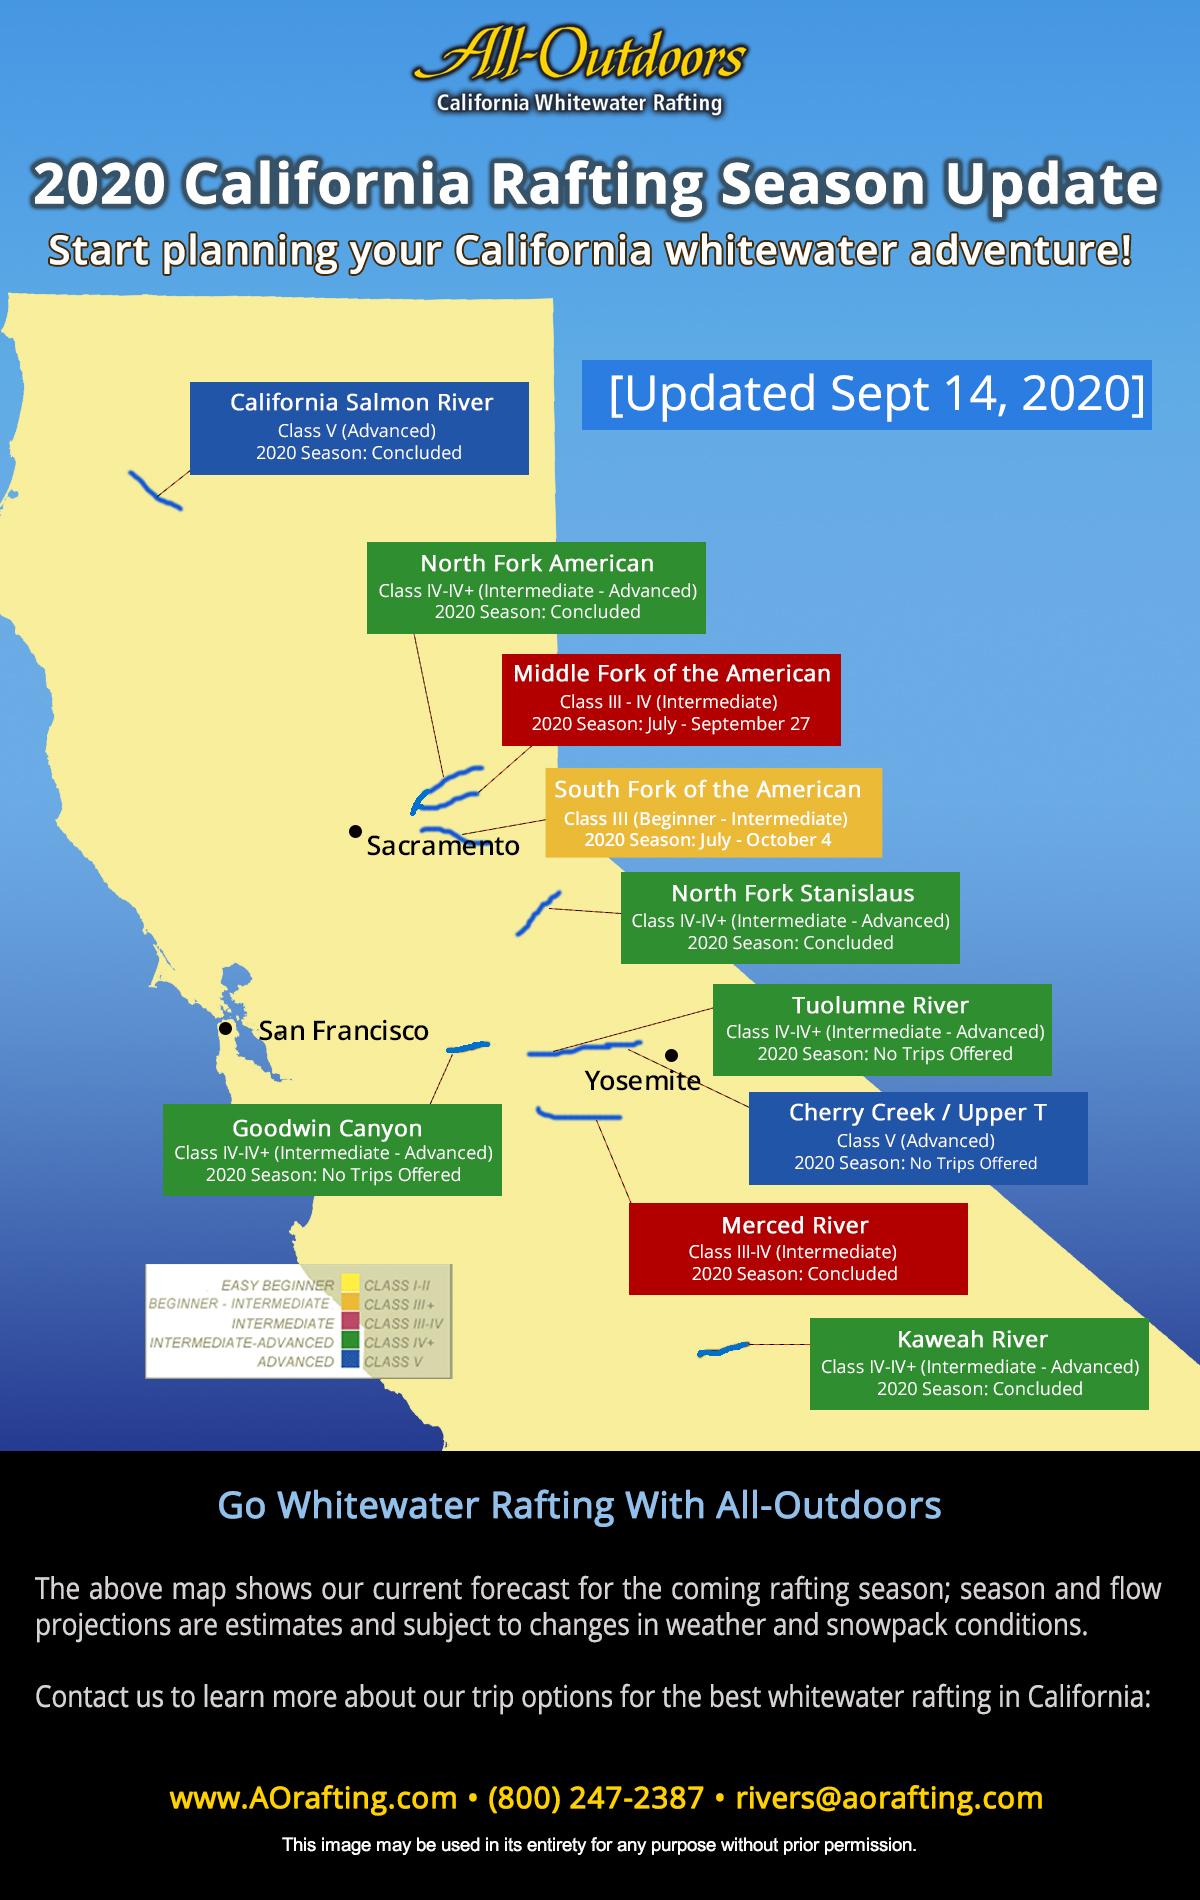 California Rafting Season Update - September 2020